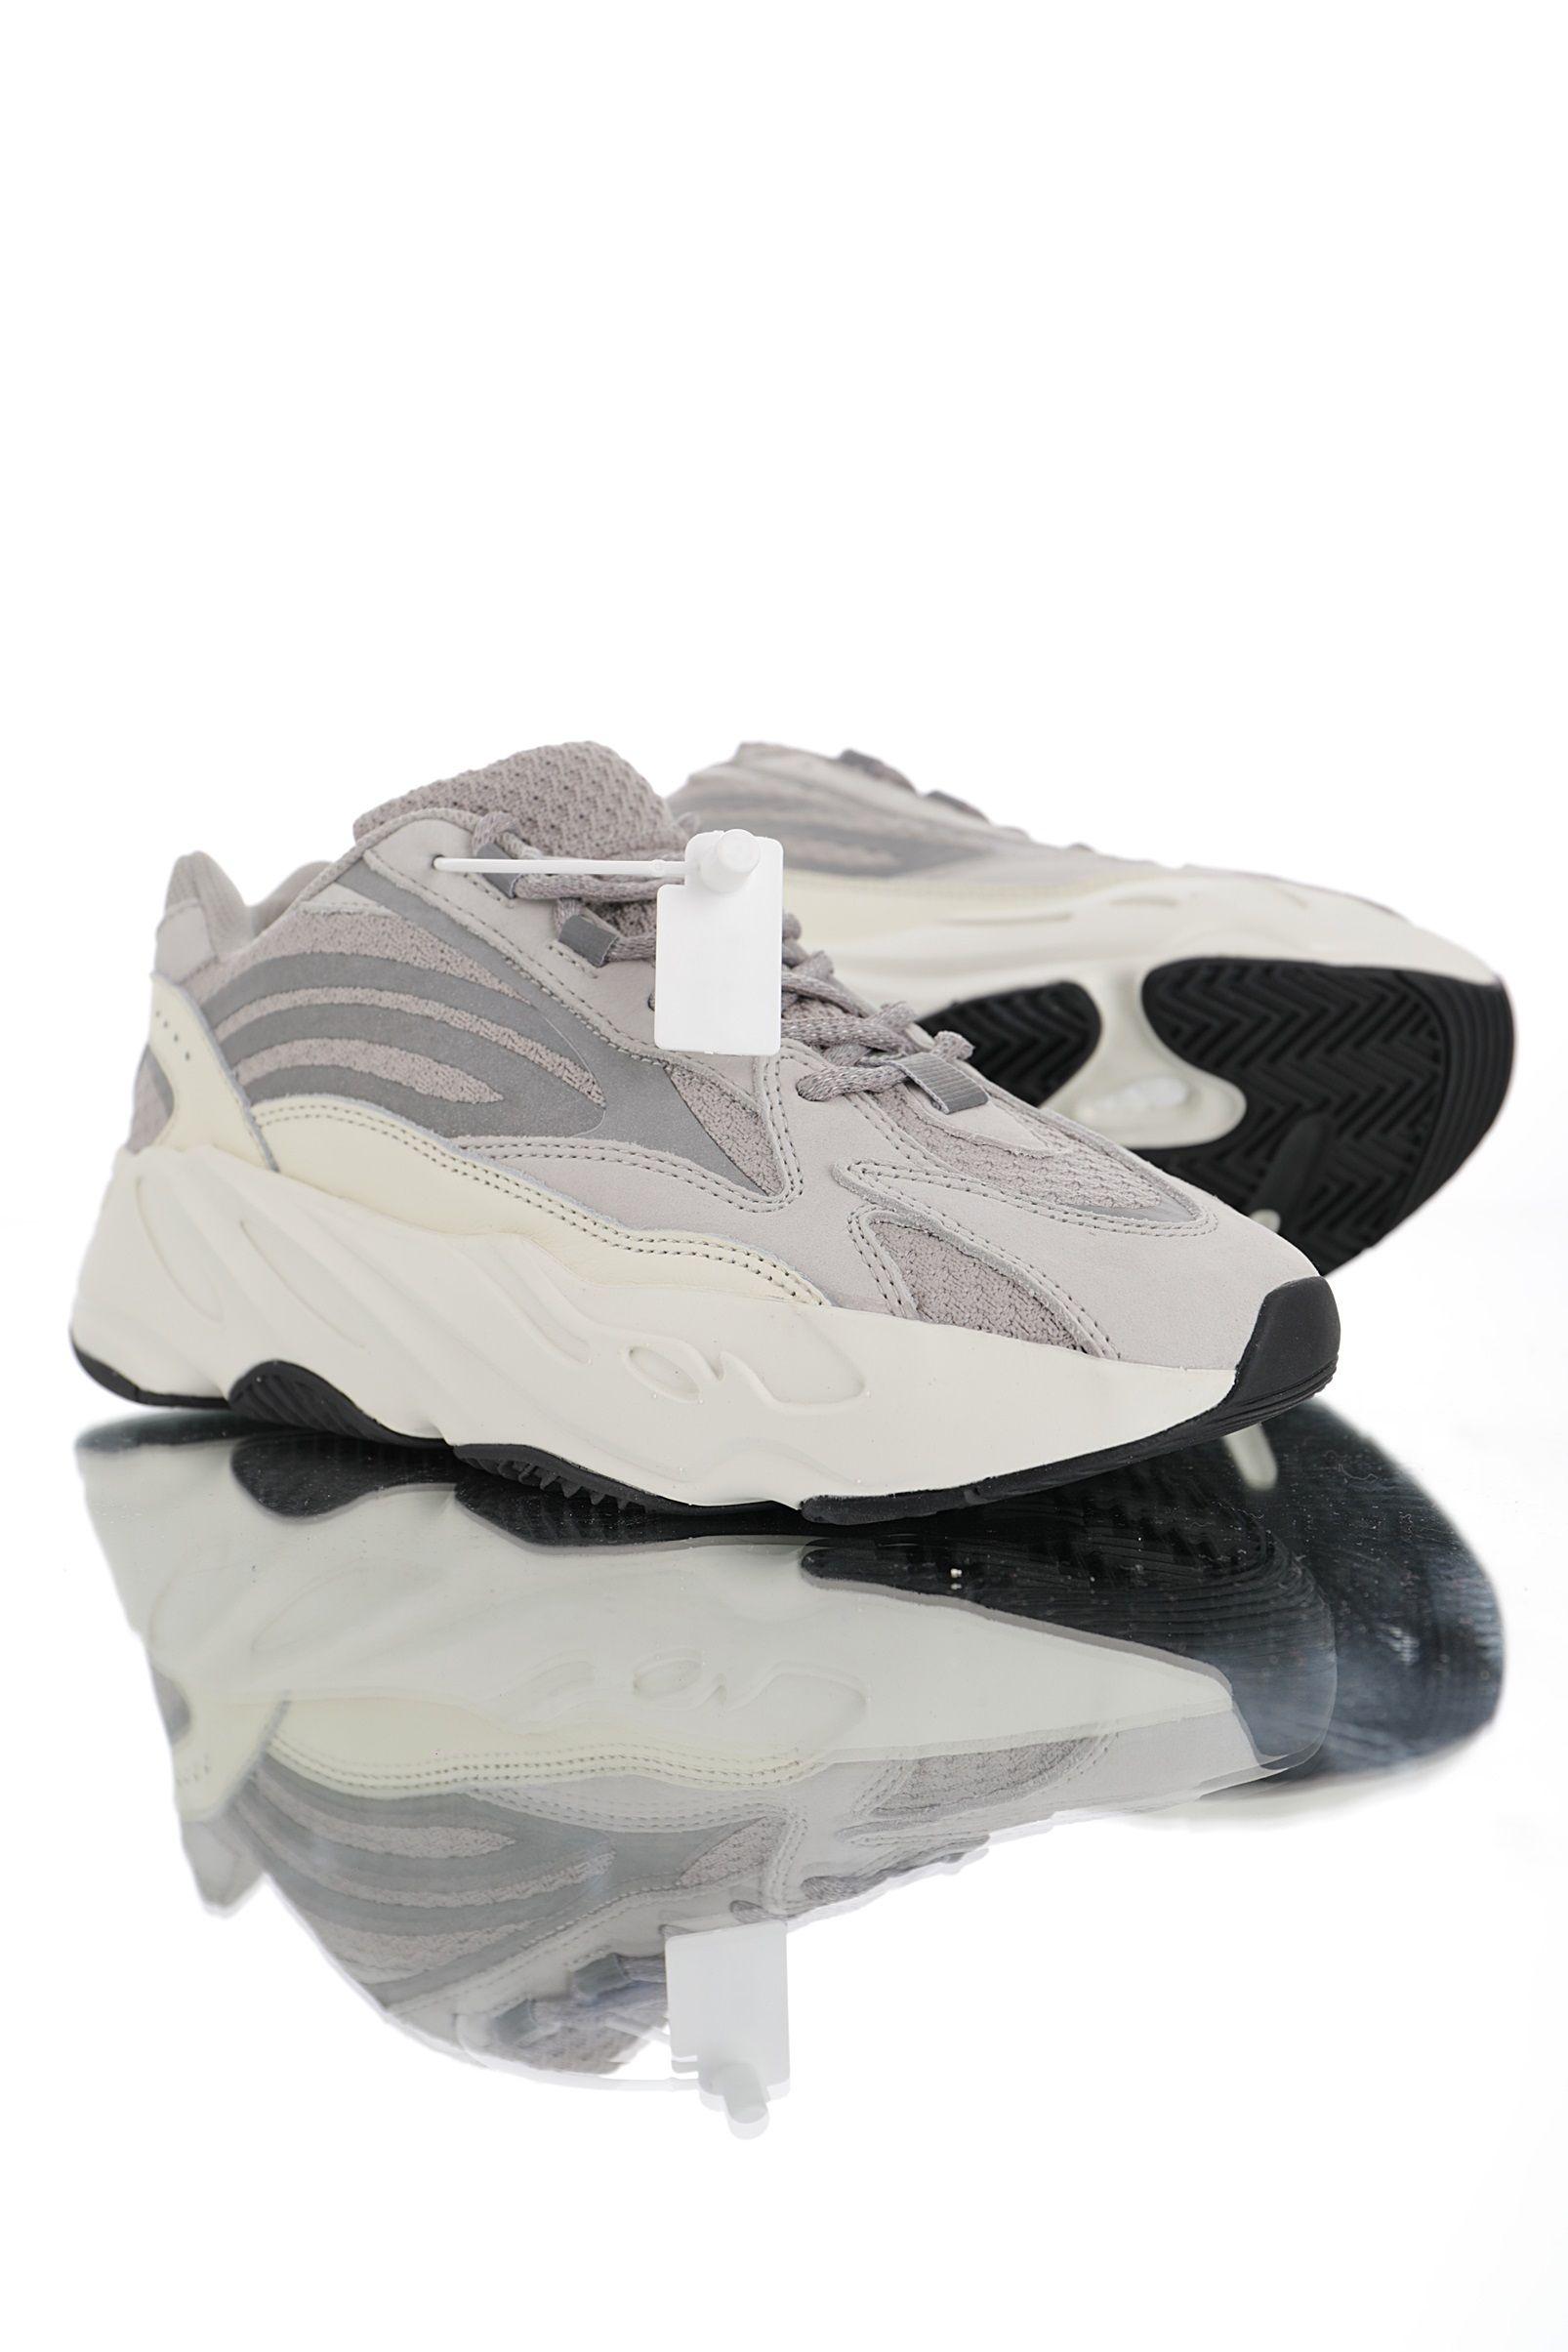 bc73cb291 New 700 Mauve OG Static Running Shoes Kanye West Boost Men Women ...